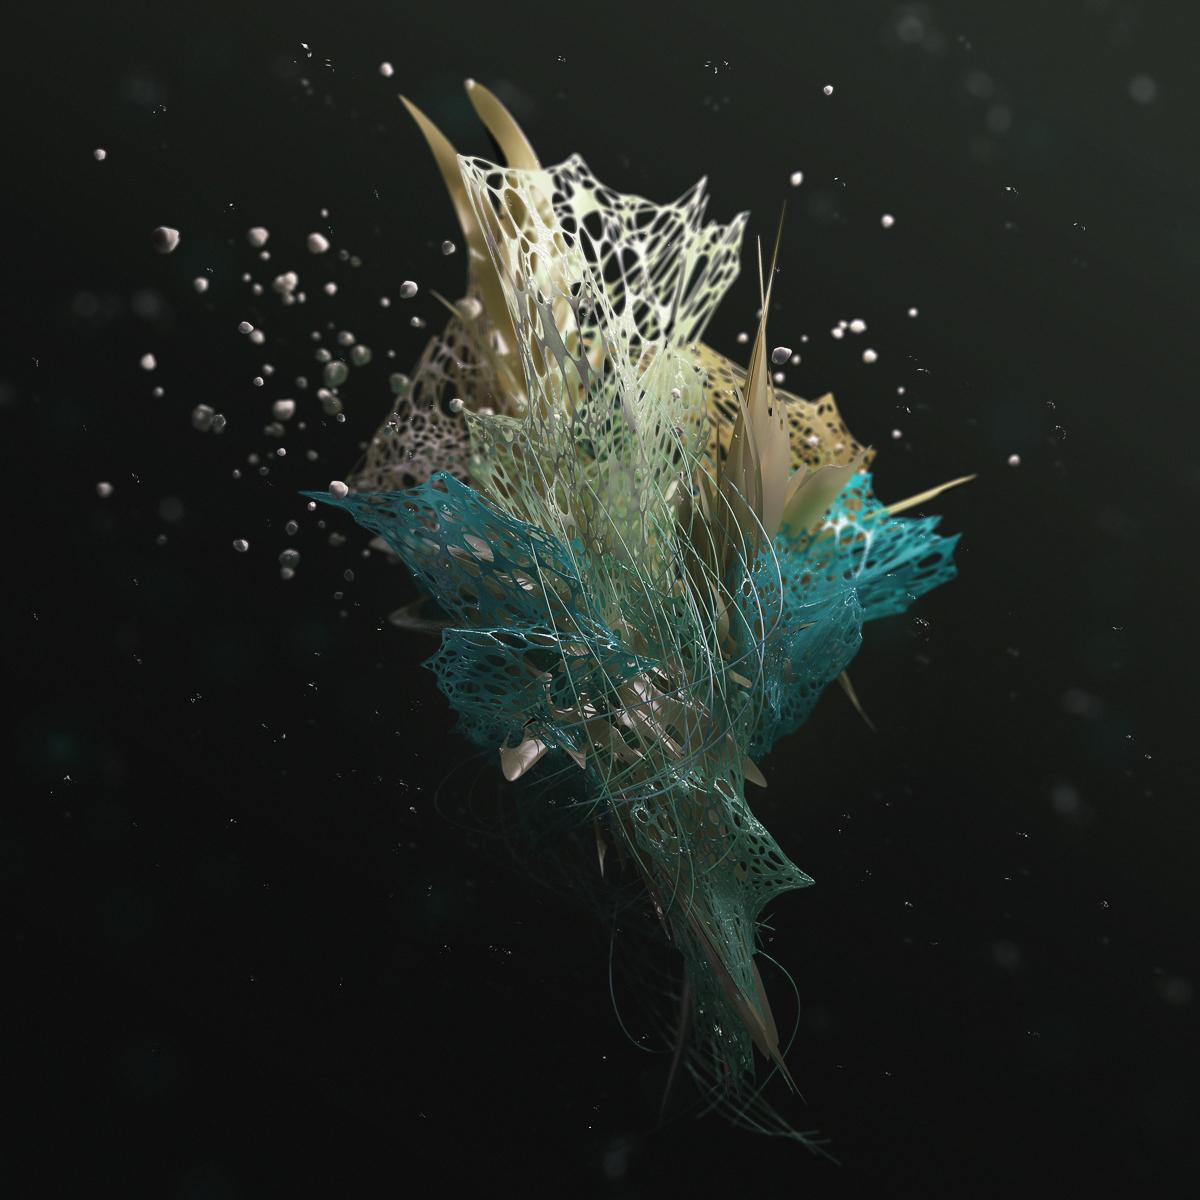 Exoshell - Bioshap3d 3D project